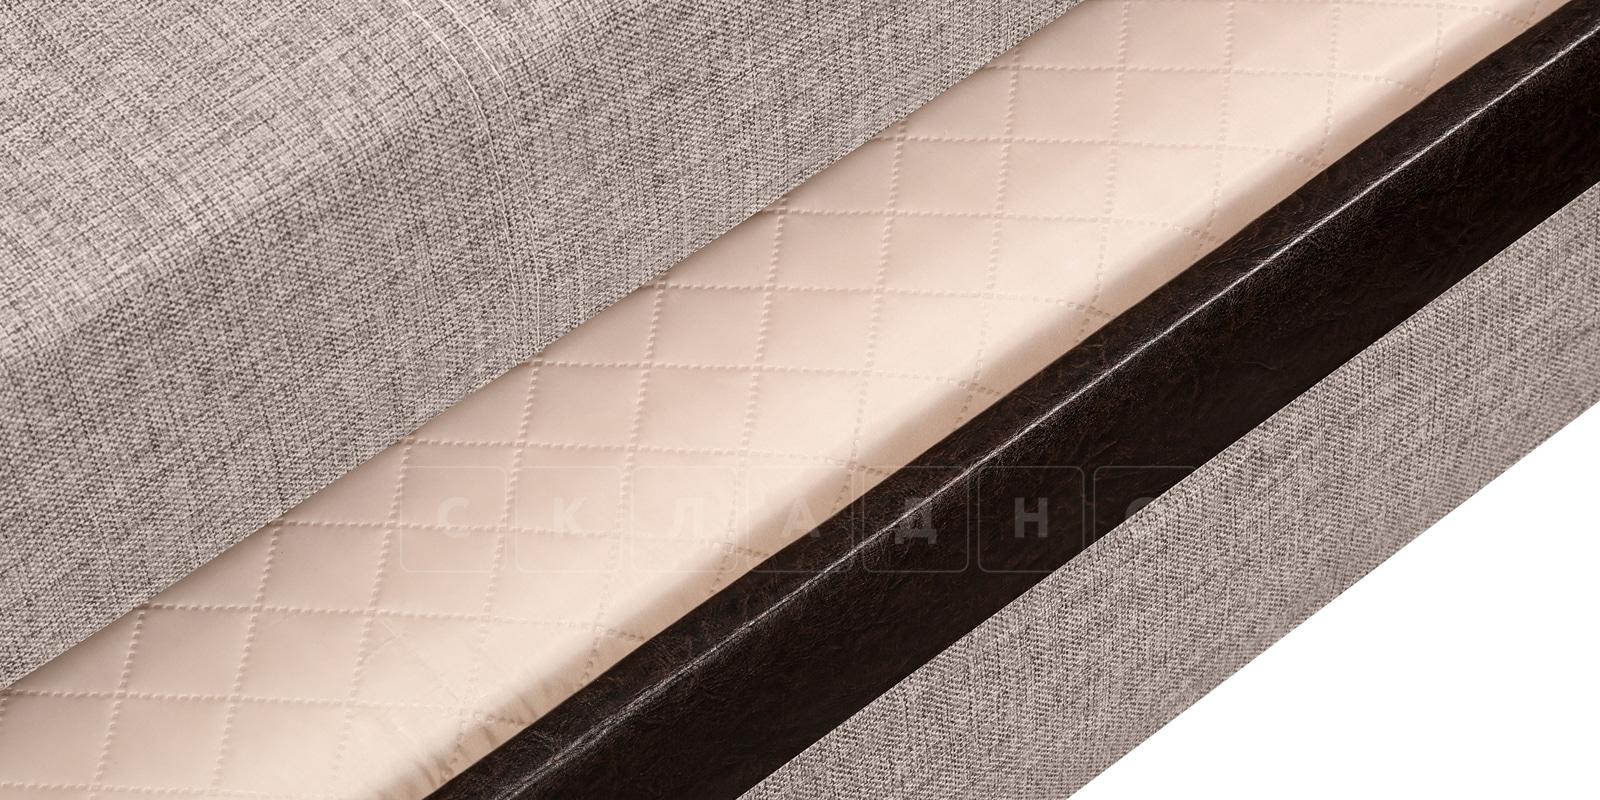 Угловой диван Атланта рогожка темно-бежевого цвета фото 5 | интернет-магазин Складно